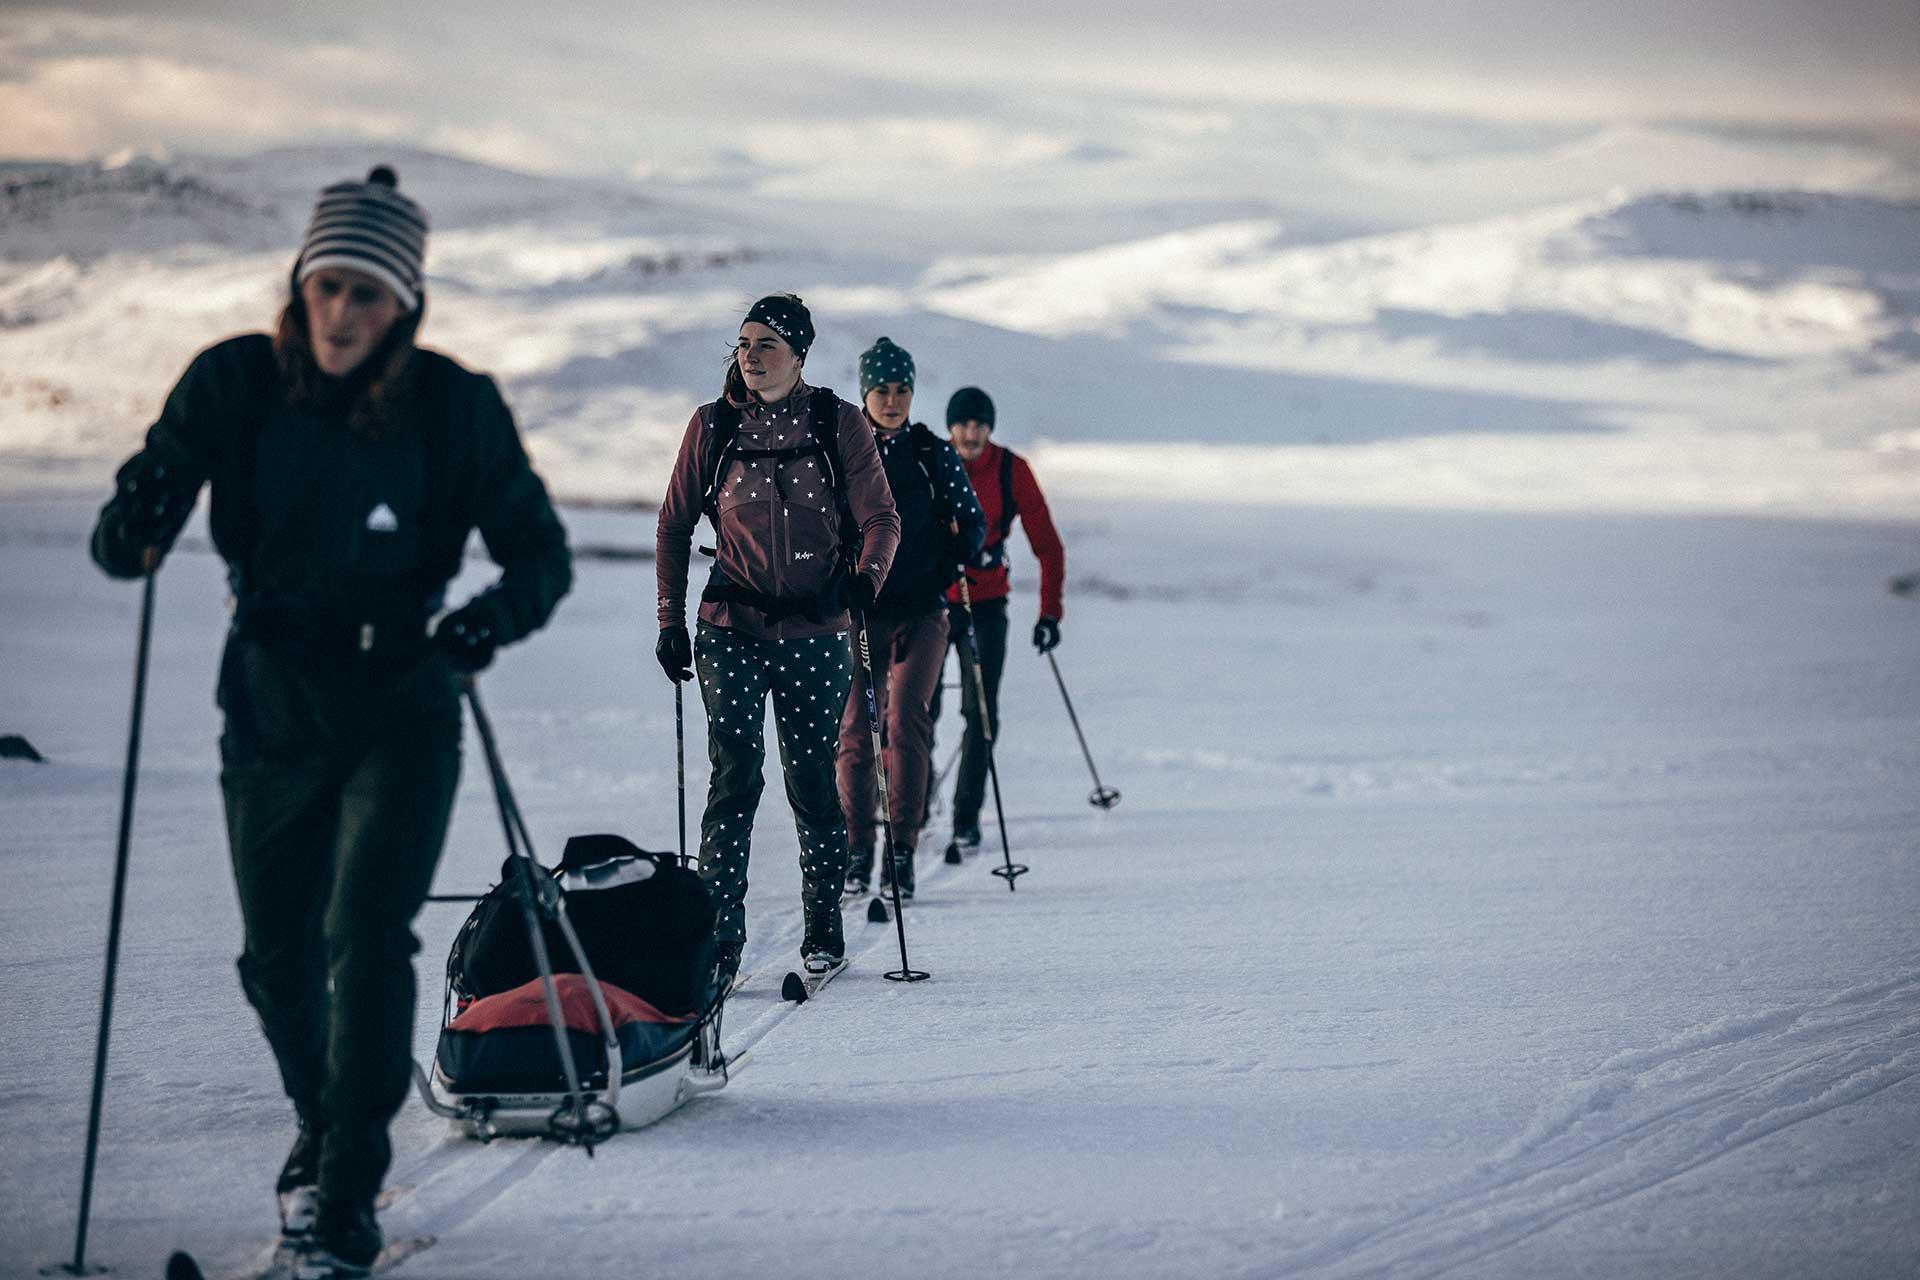 Ski Tour Langlauf Winter Fotograf Schnee Horizont